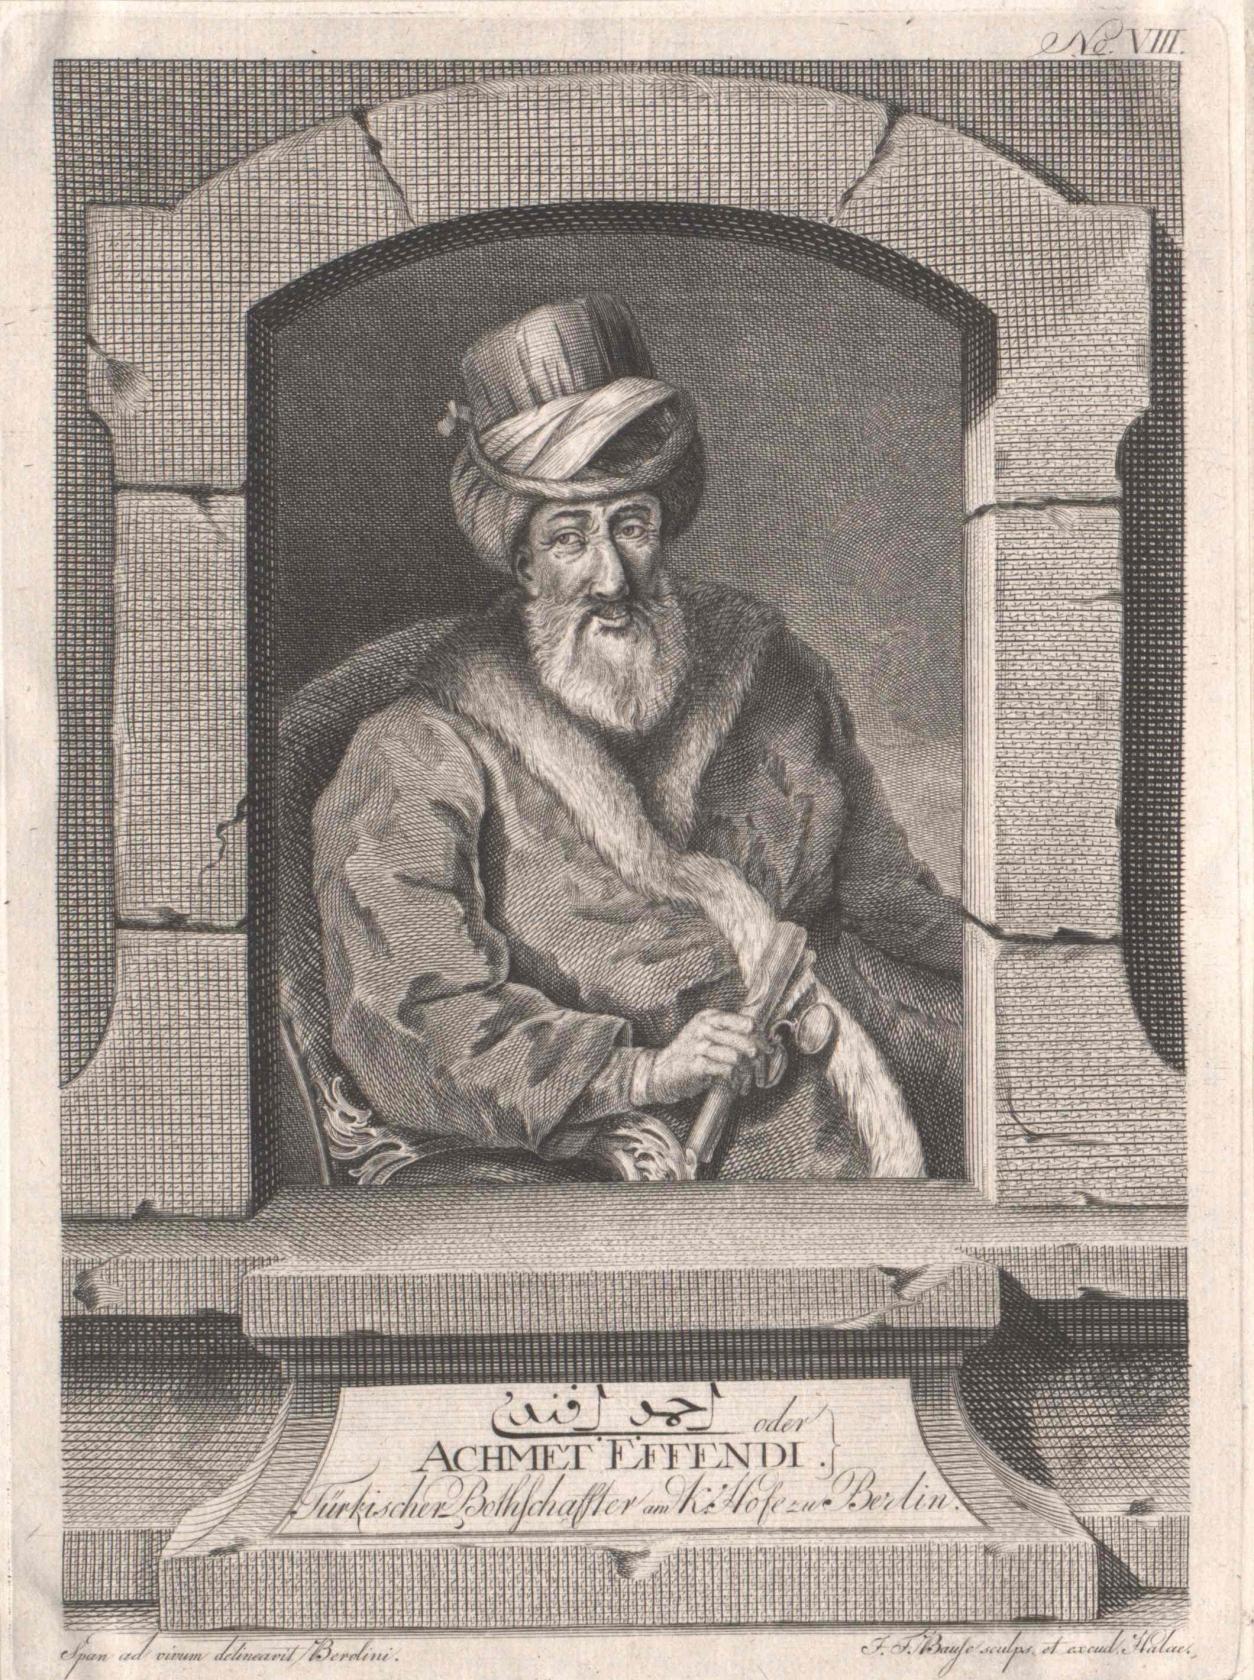 https://upload.wikimedia.org/wikipedia/commons/b/b9/Ahmed_Resmi_Greek.JPG